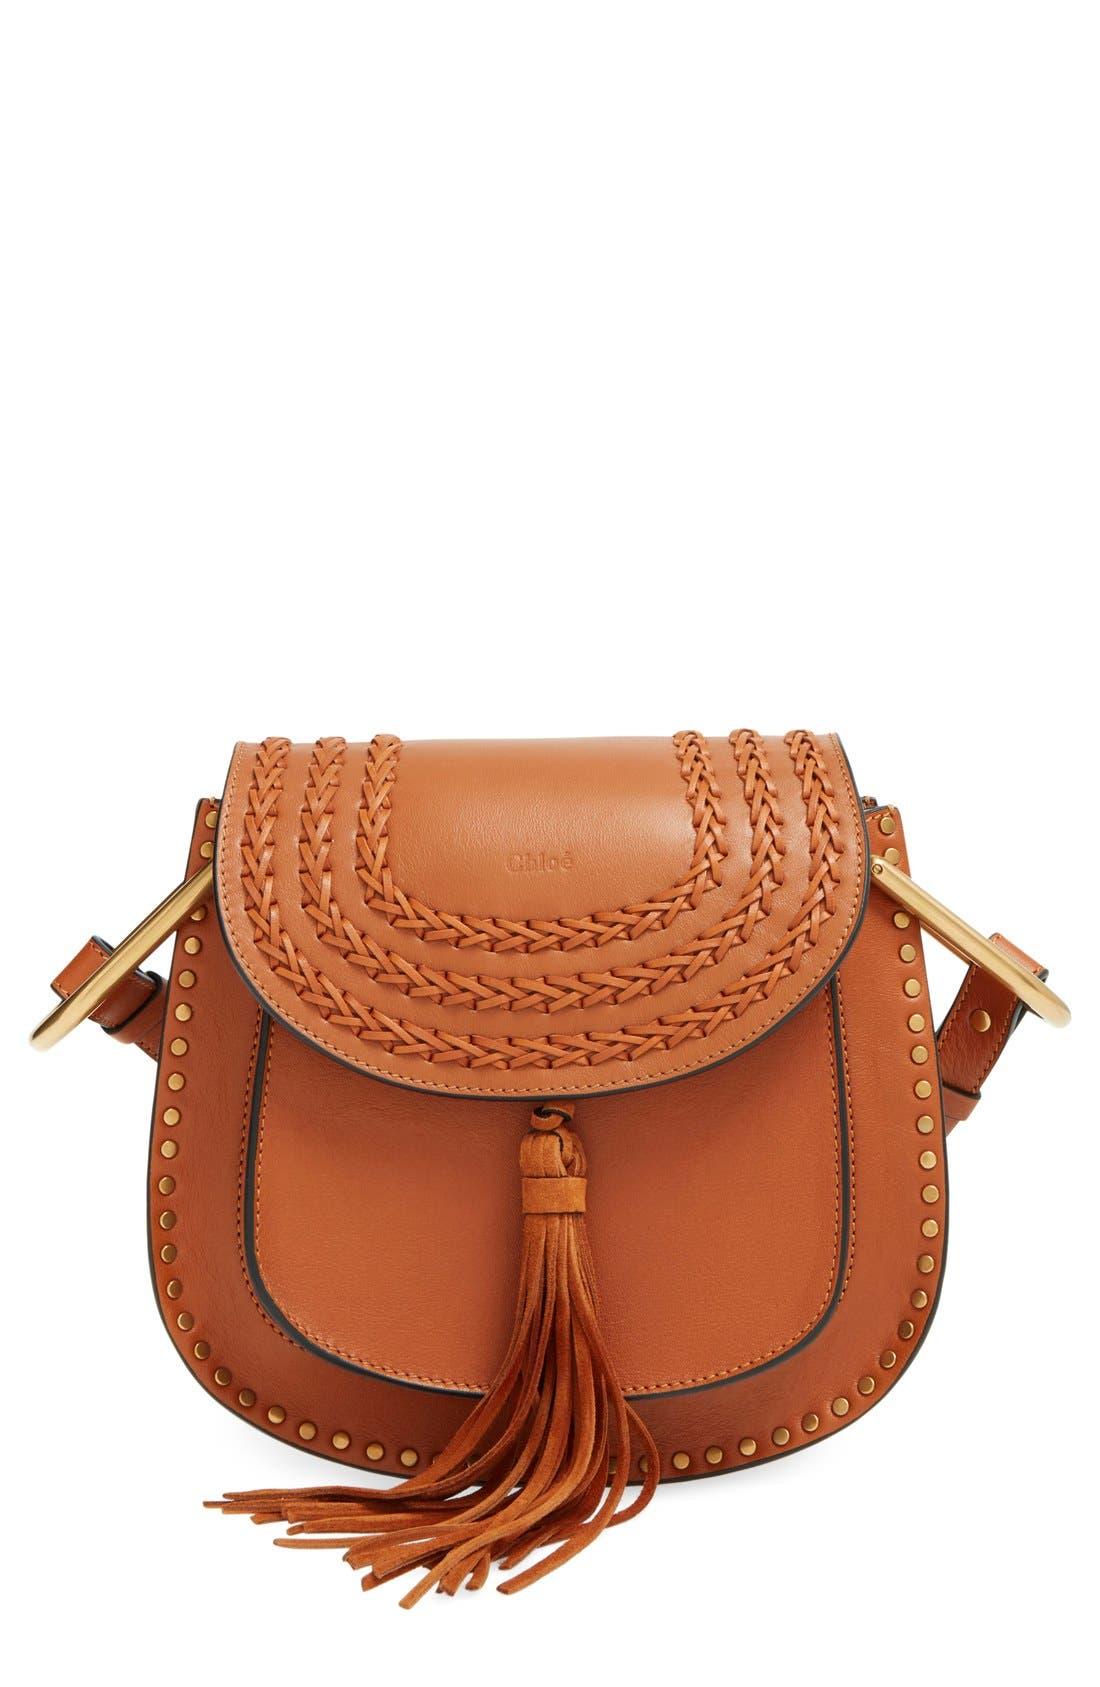 'Small Hudson' Studded Calfskin Leather Crossbody Bag,                         Main,                         color, Caramel